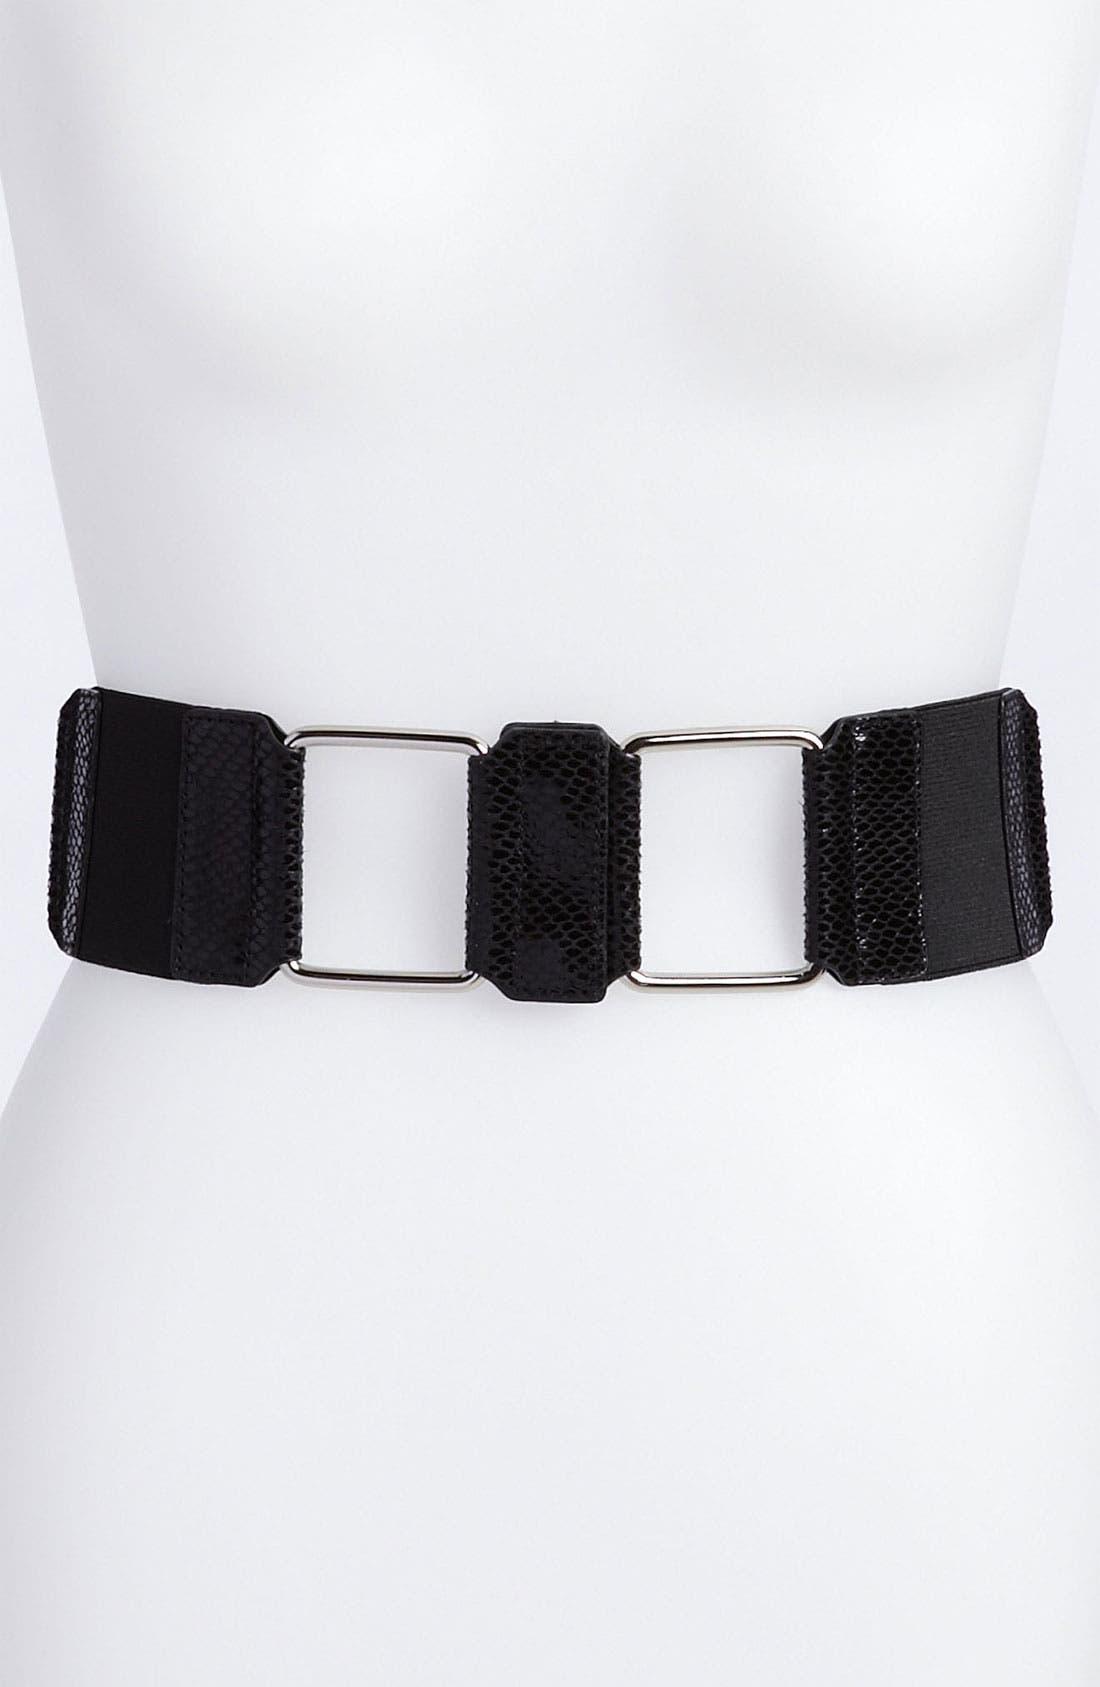 Main Image - Via Spiga Metallic Python Print Stretch Belt